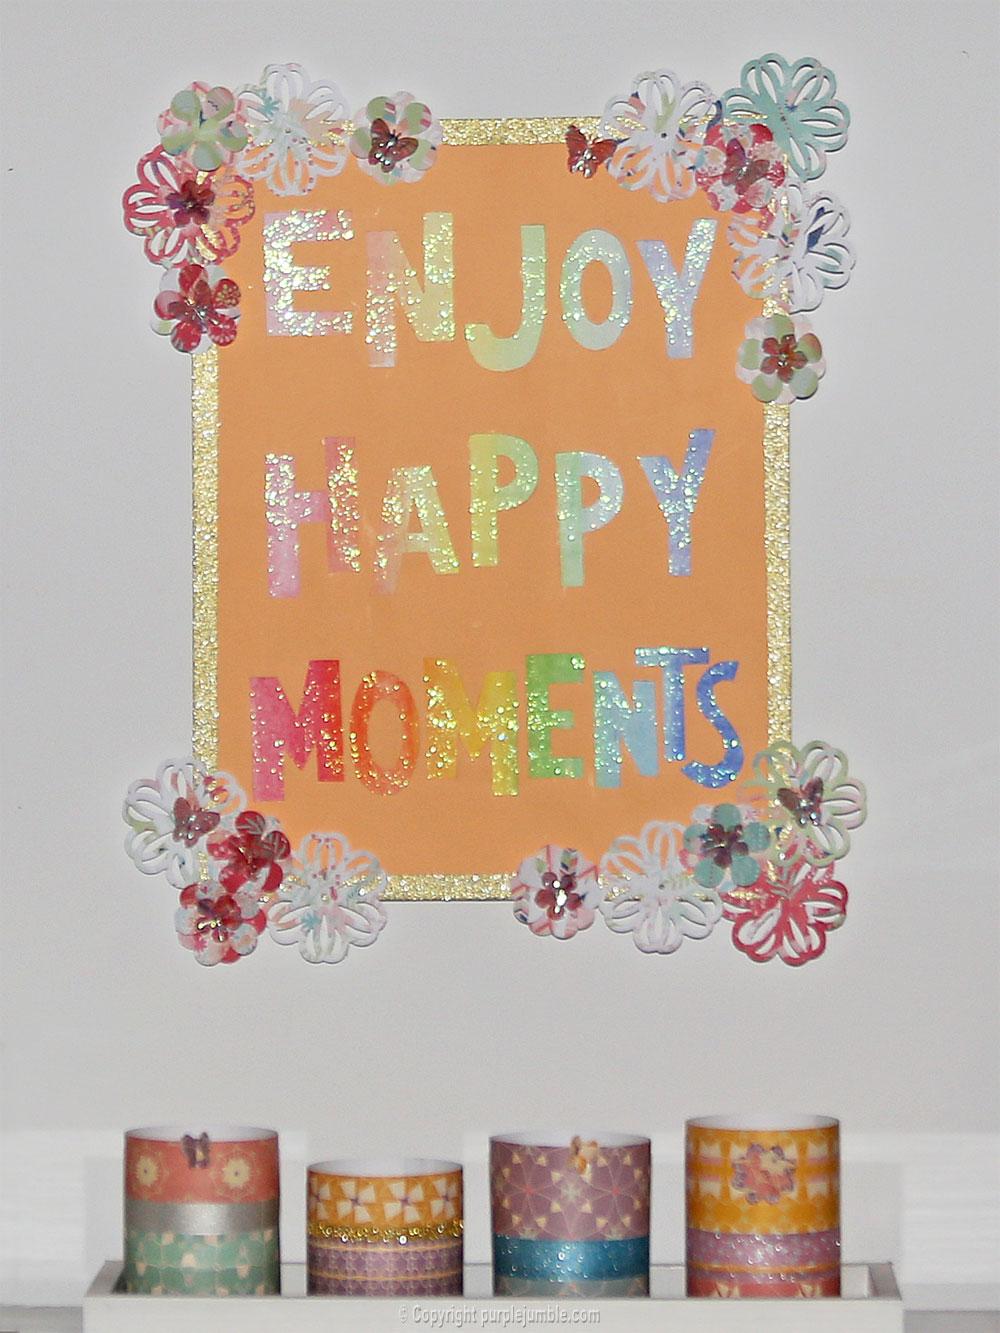 affiche enjoy happy moments mur